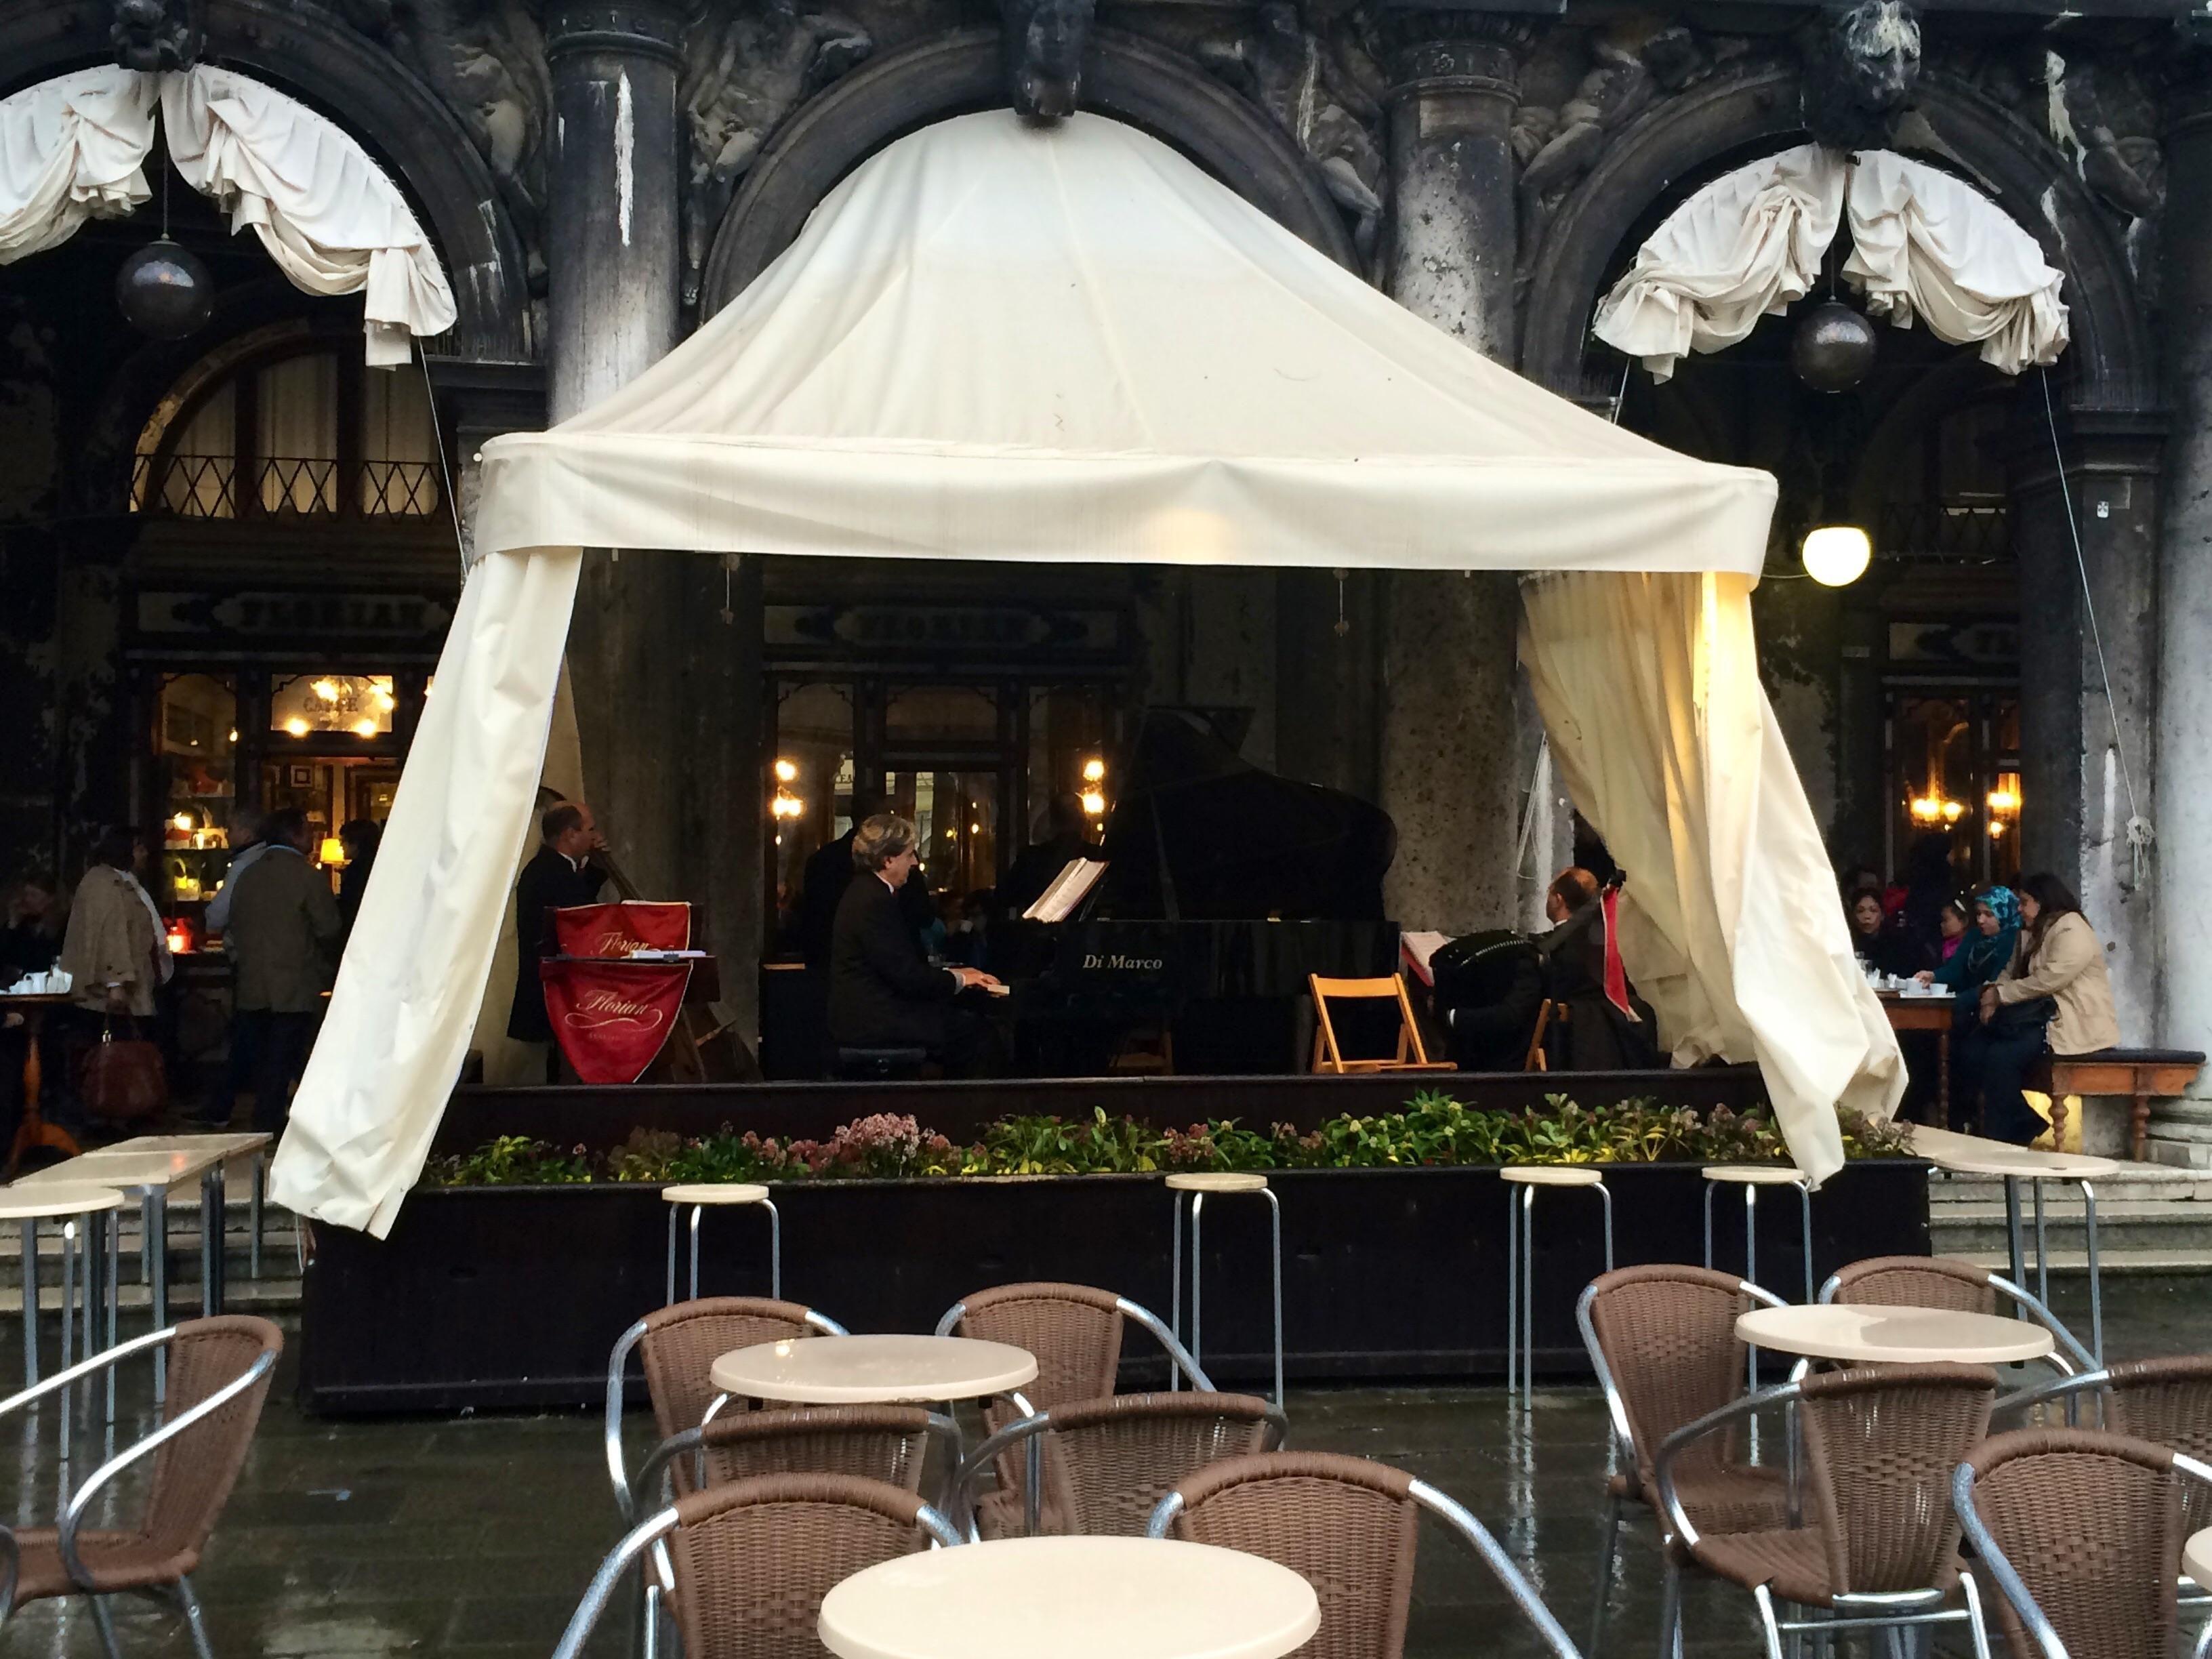 Caffe Florian, Venecia Opiniones sobre restaurantes